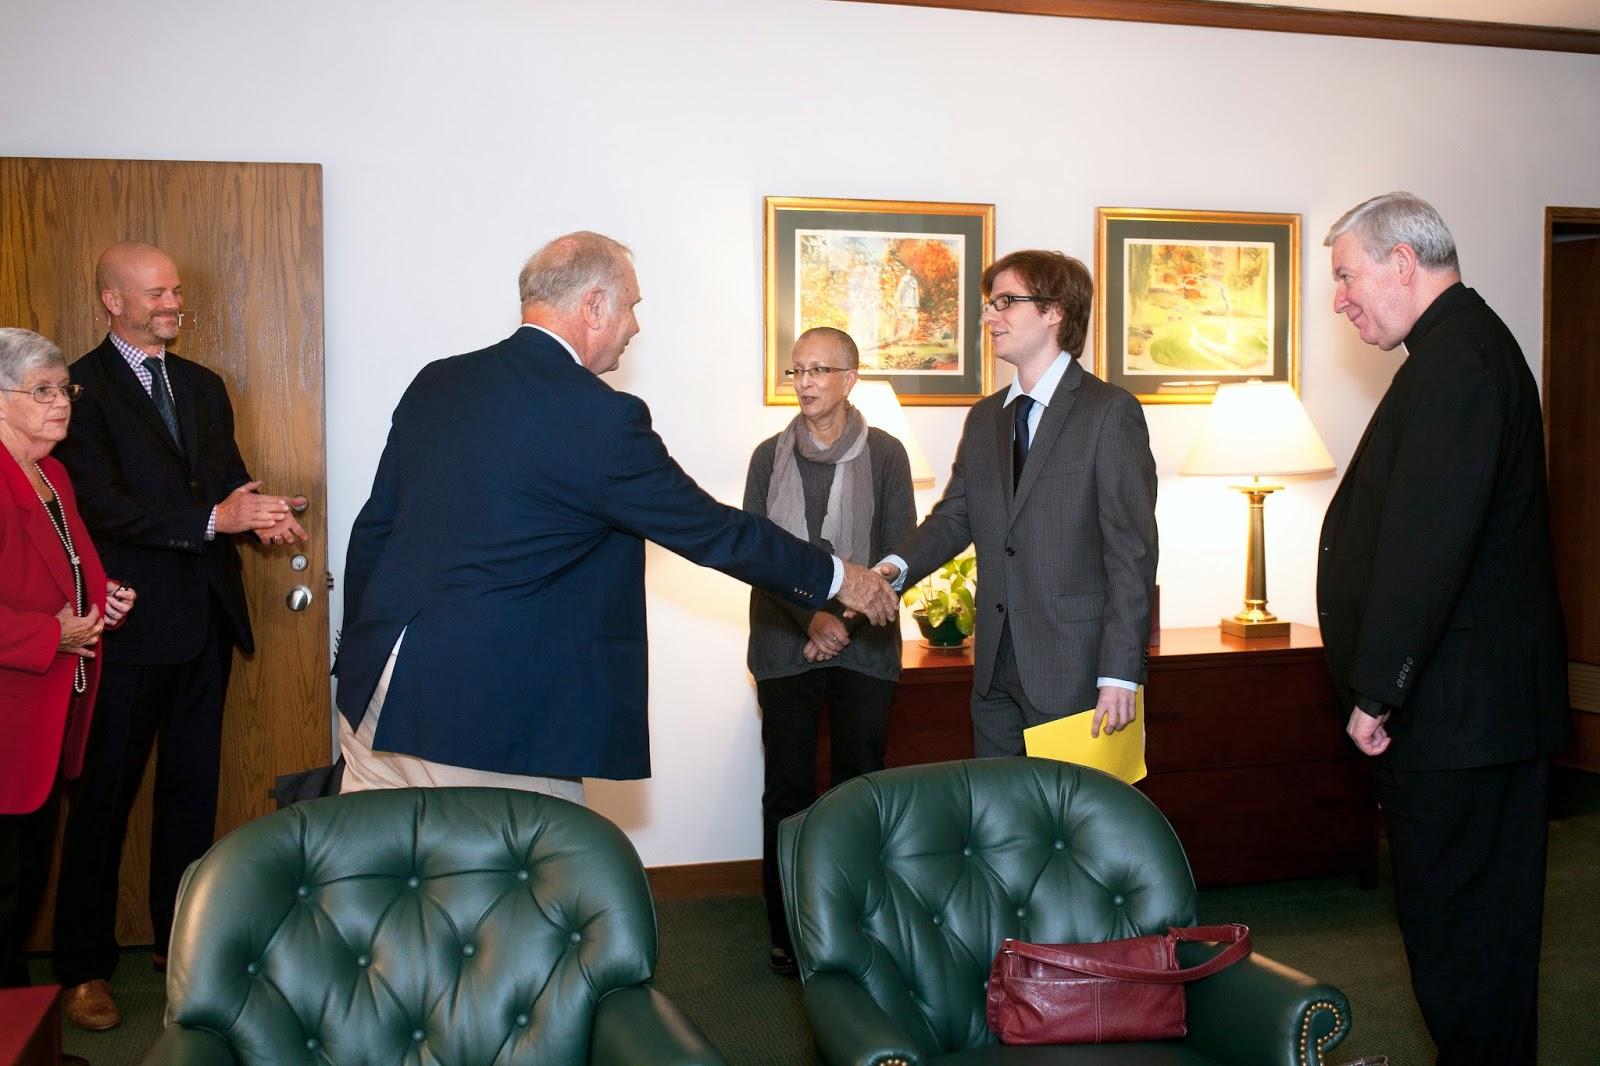 Beinecke Scholarship Winner Honored